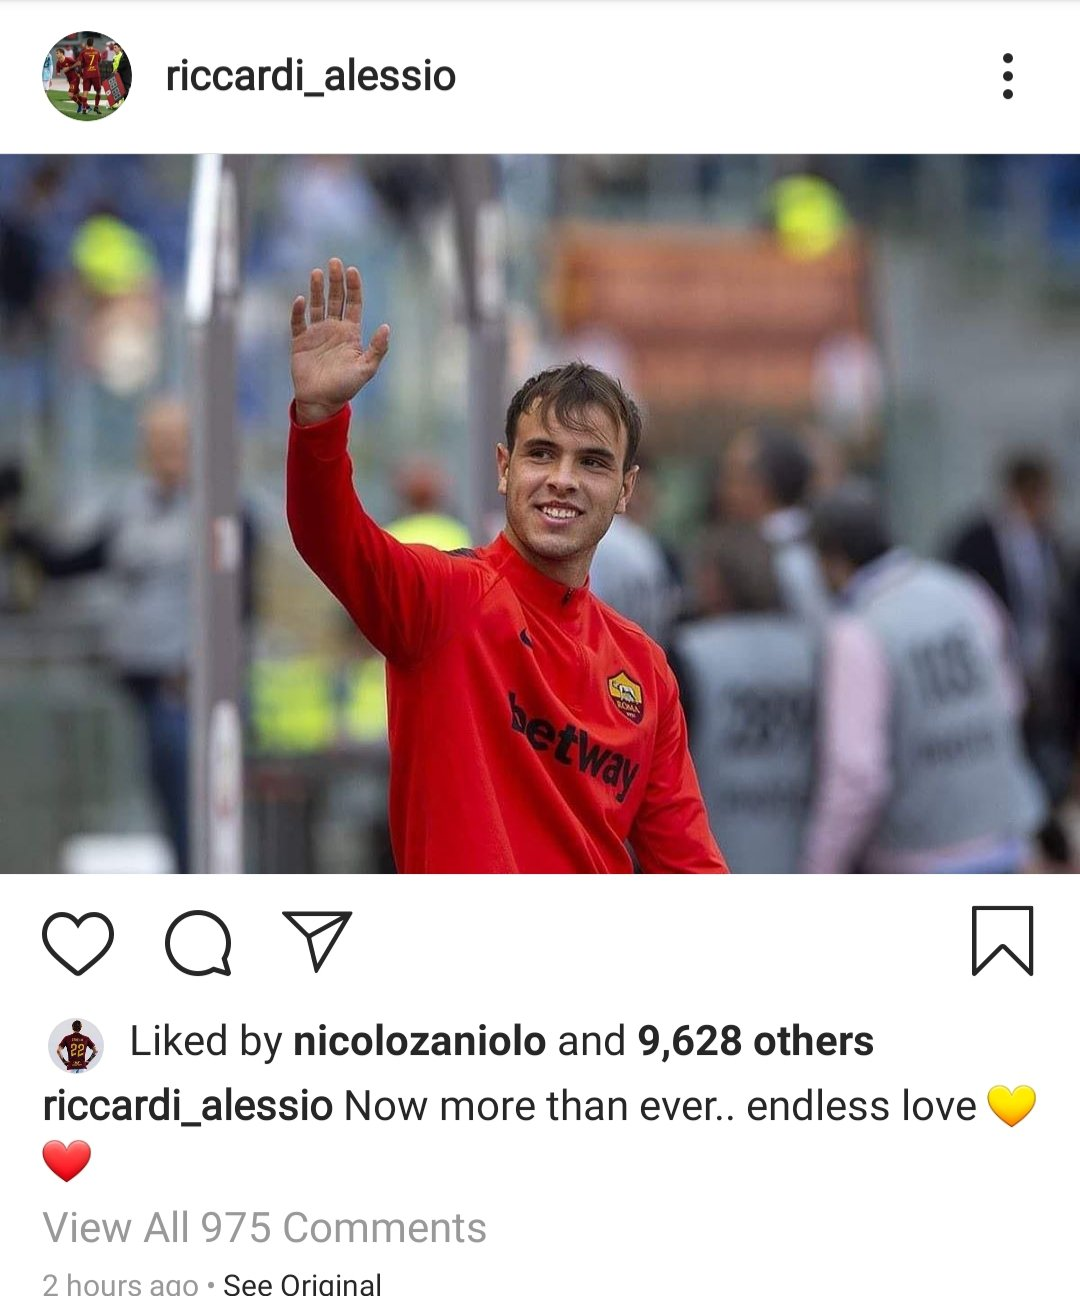 Alessio Riccardi on Instagram https://t.co/3xwAiry8ns